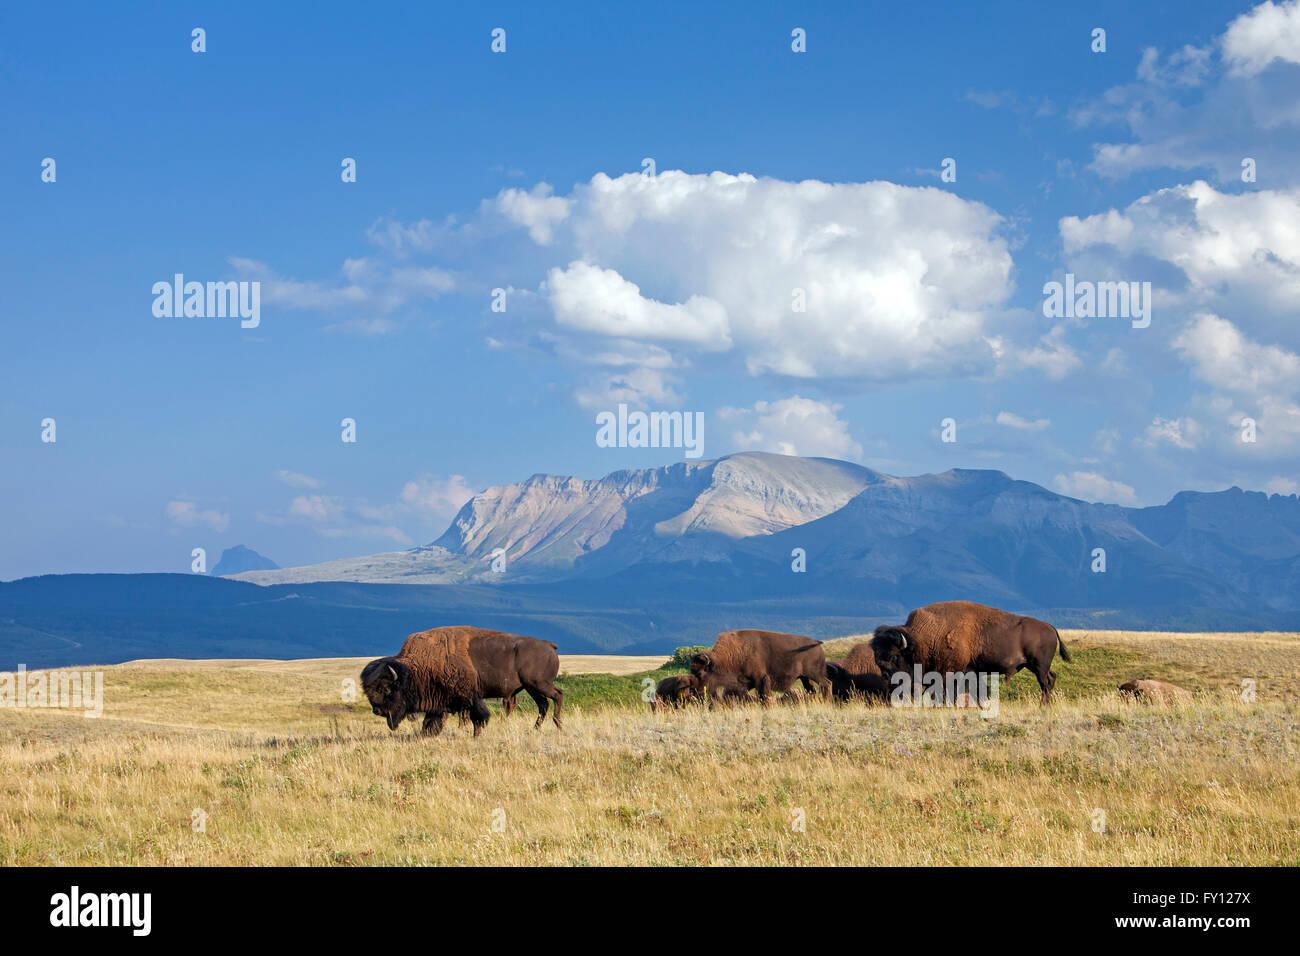 American bison / American buffalo (Bison bison) herd in summer, Waterton Lakes National Park, Alberta, Canada - Stock Image